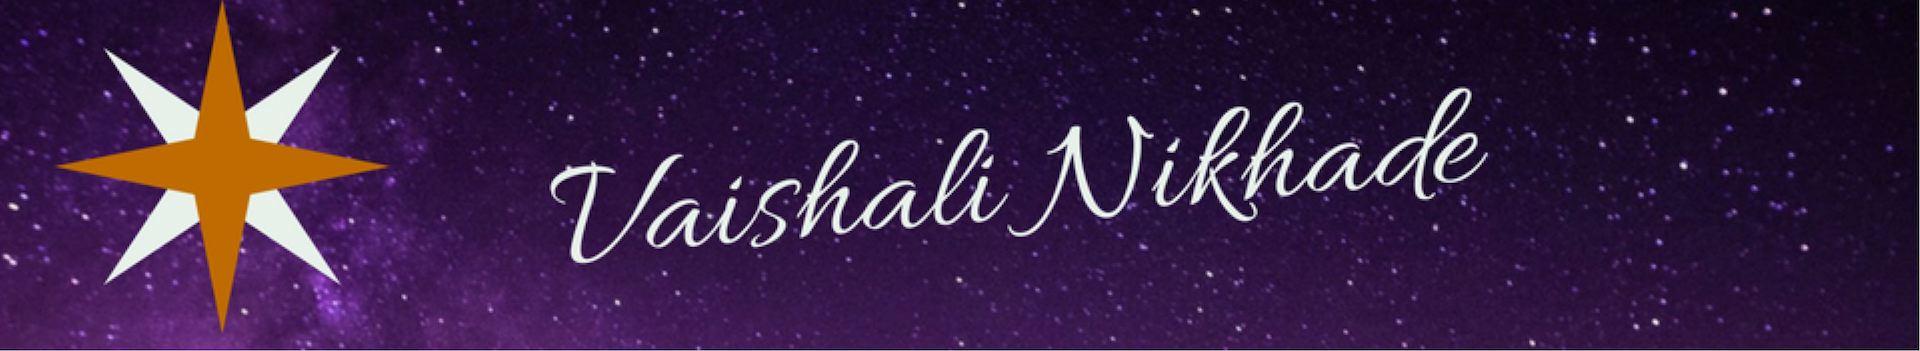 vaishali-site-header-name